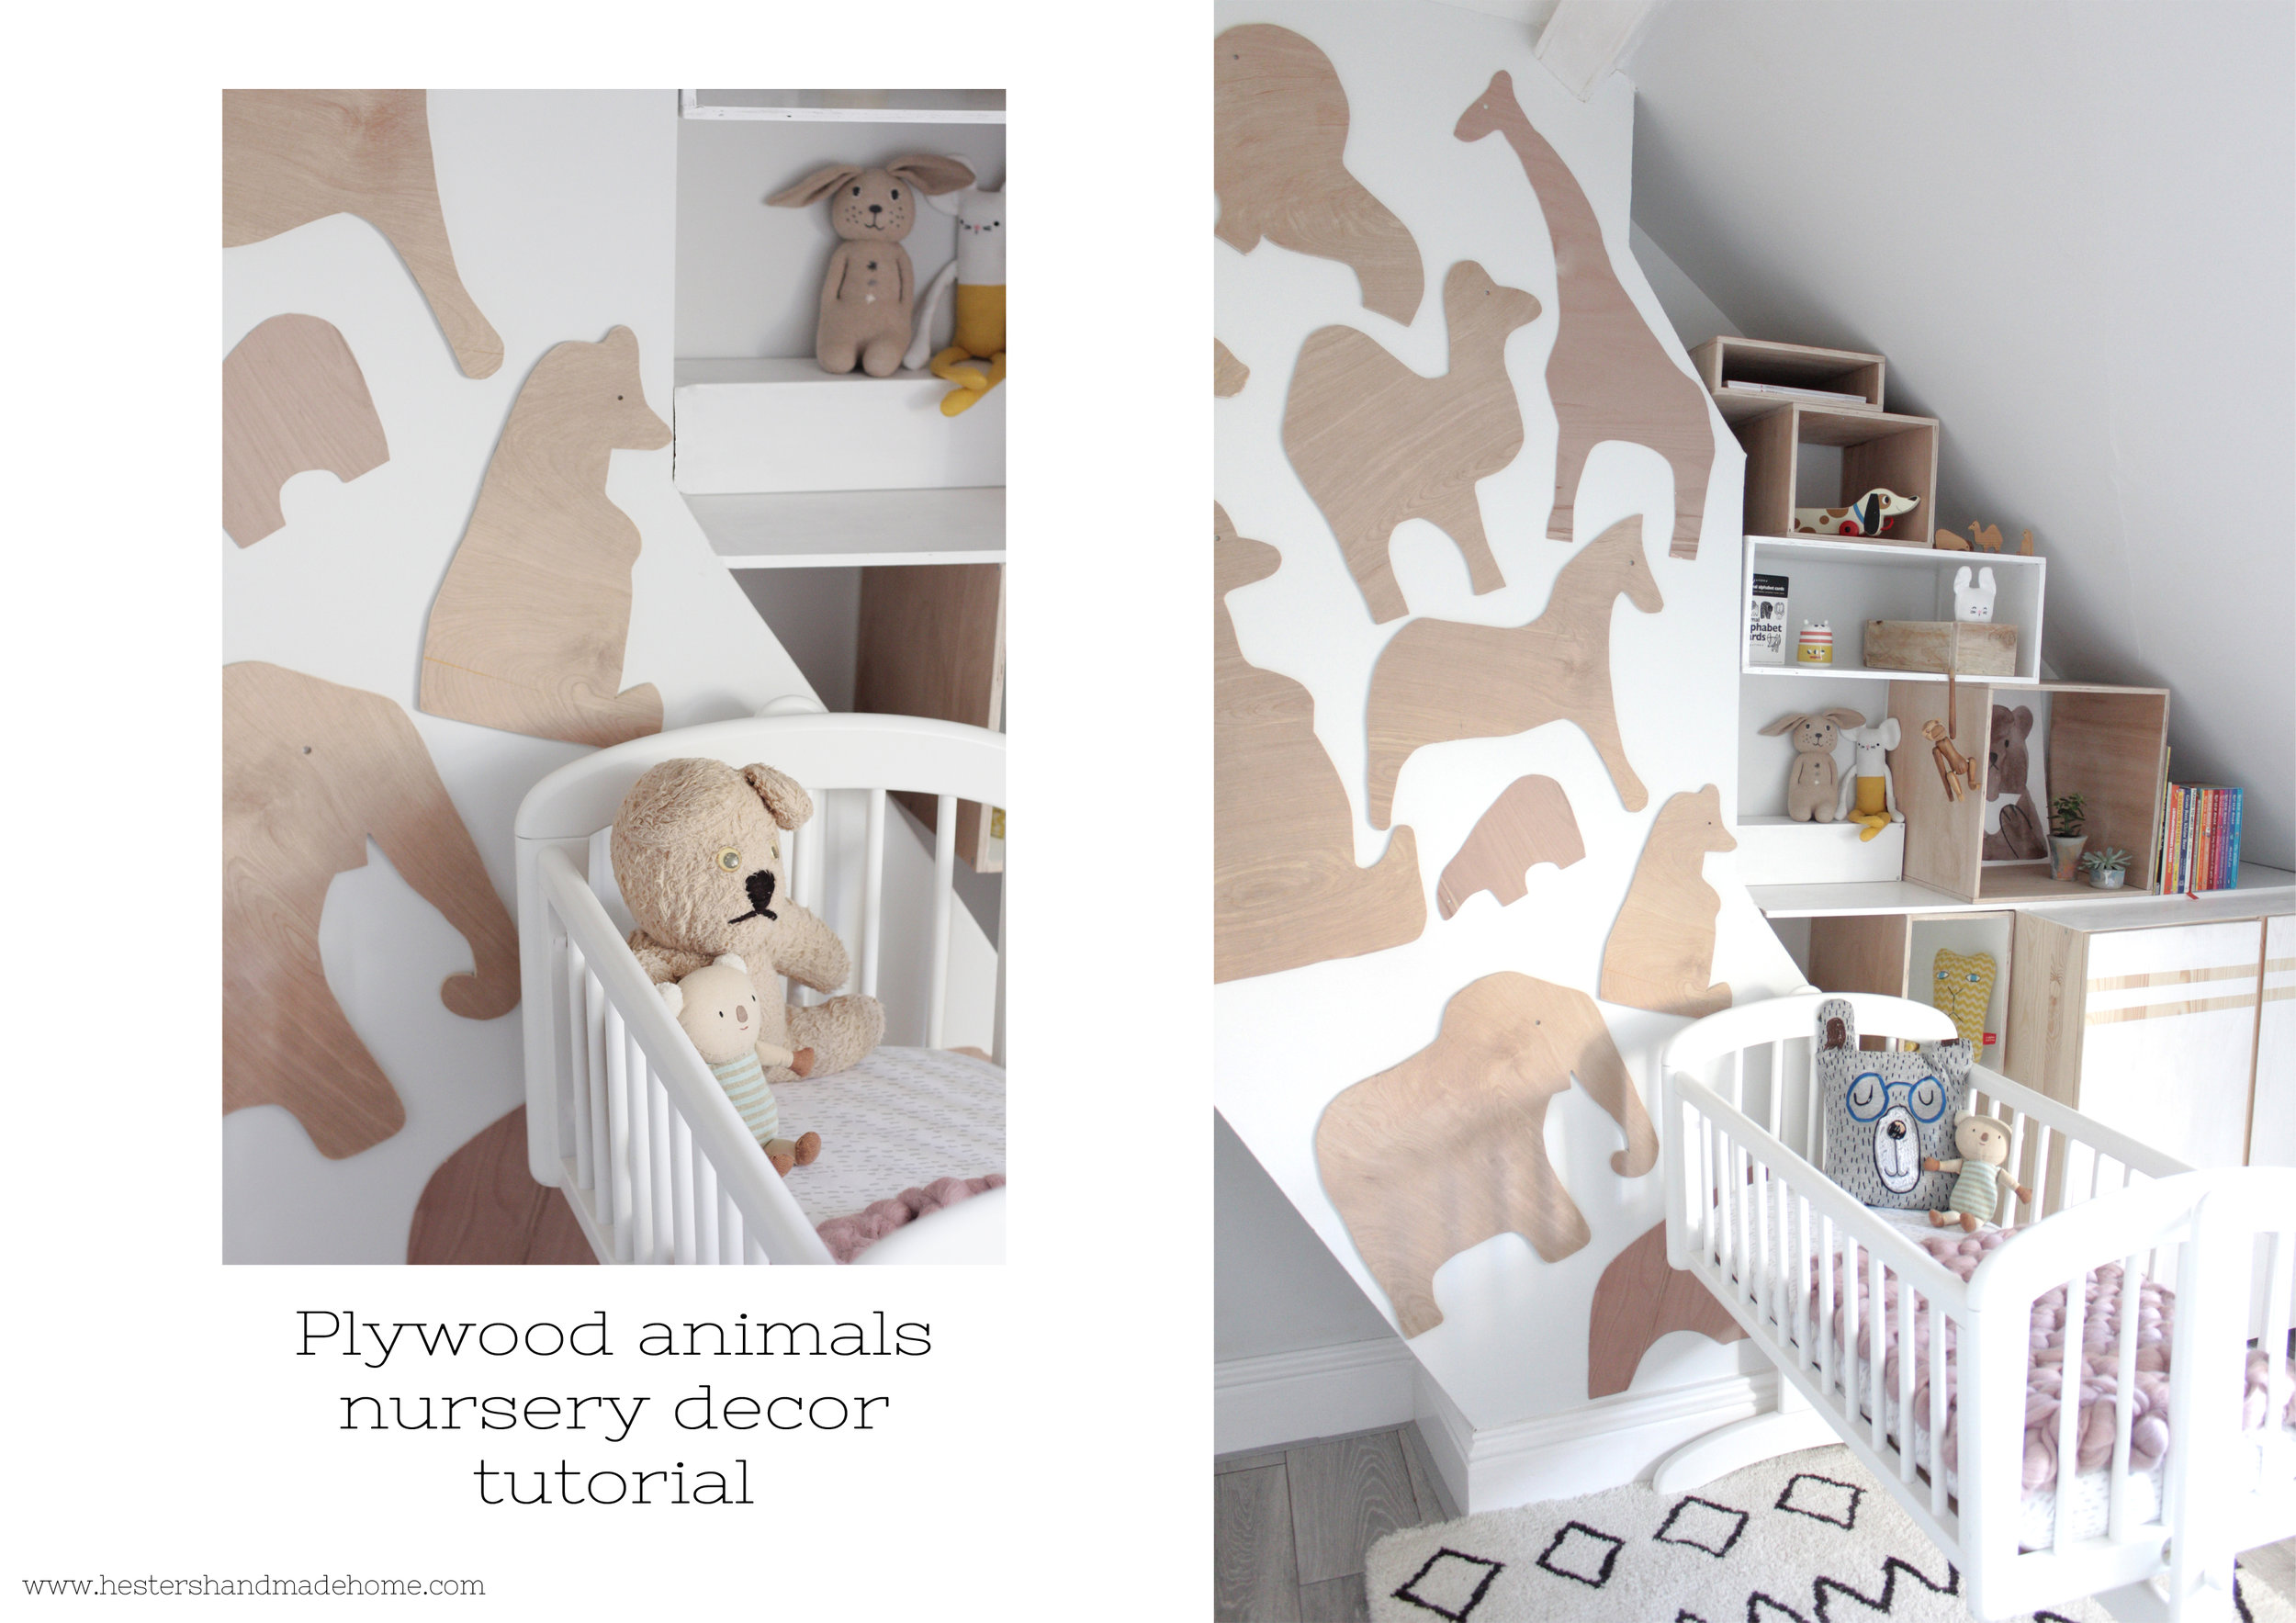 Nursery decor, plywood animal wall. Tutorial by www.hestershandmadehome.com